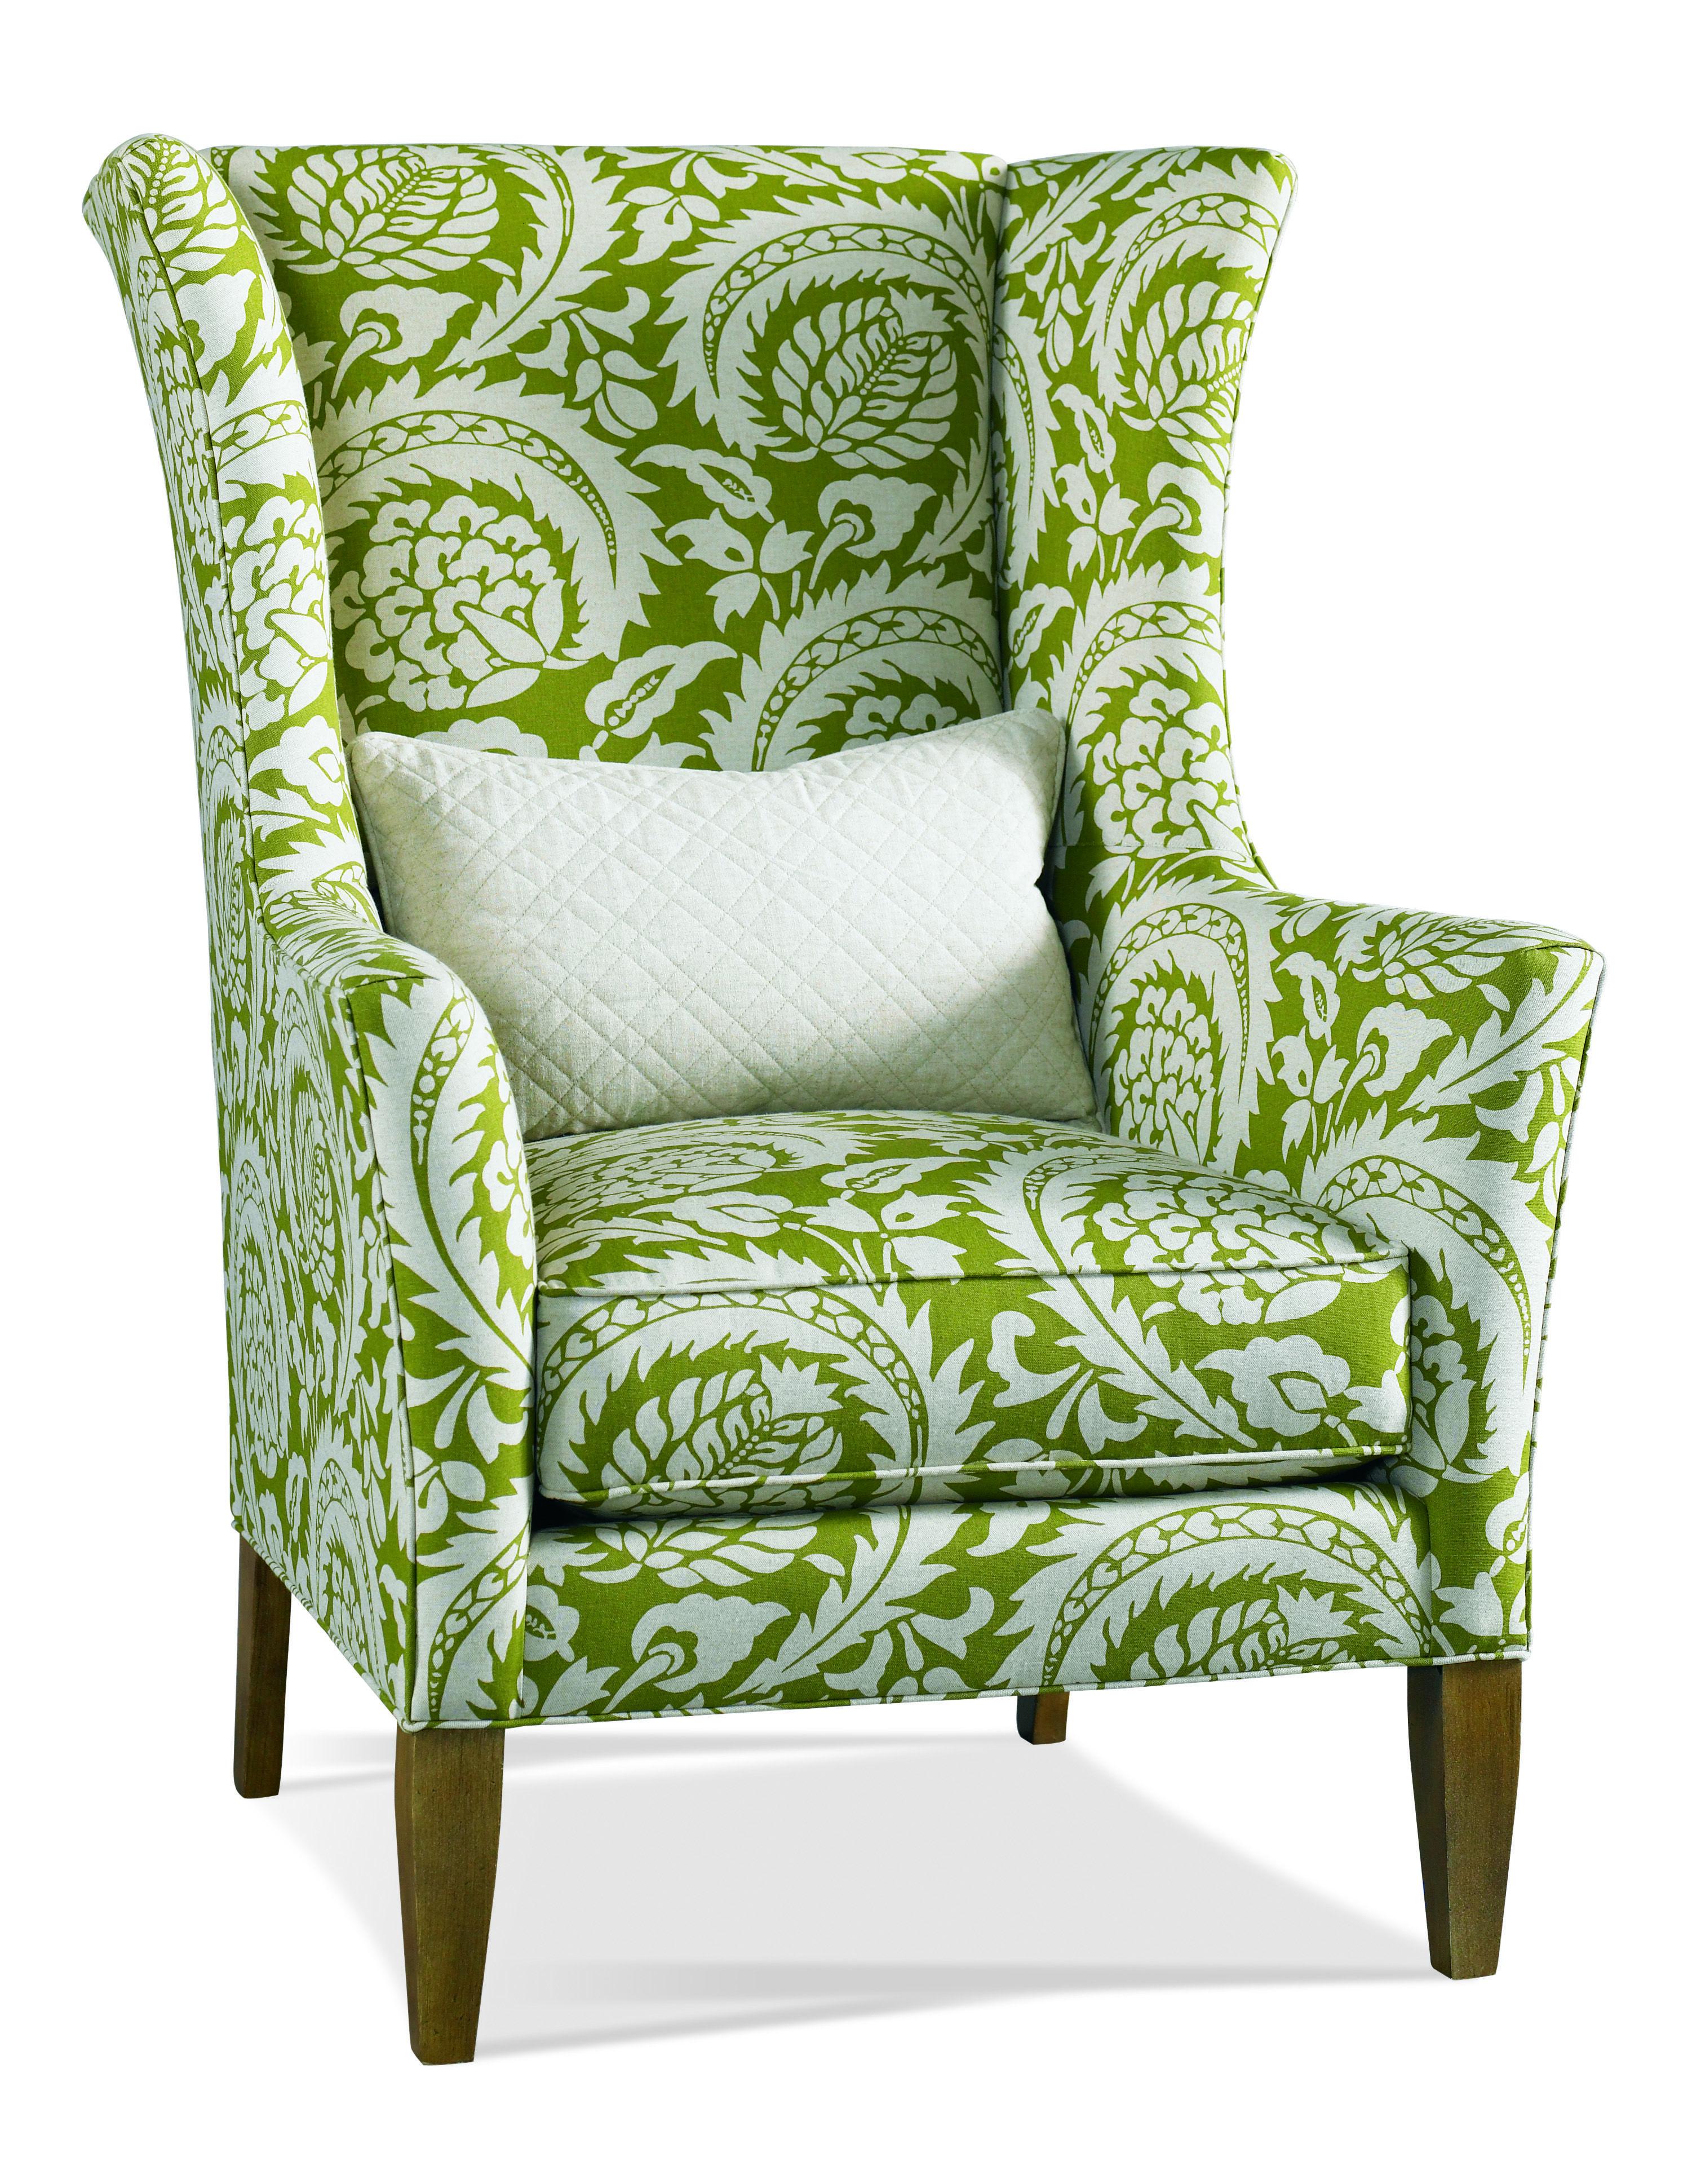 This Hickory White fully upholstered chair wjtb kidney